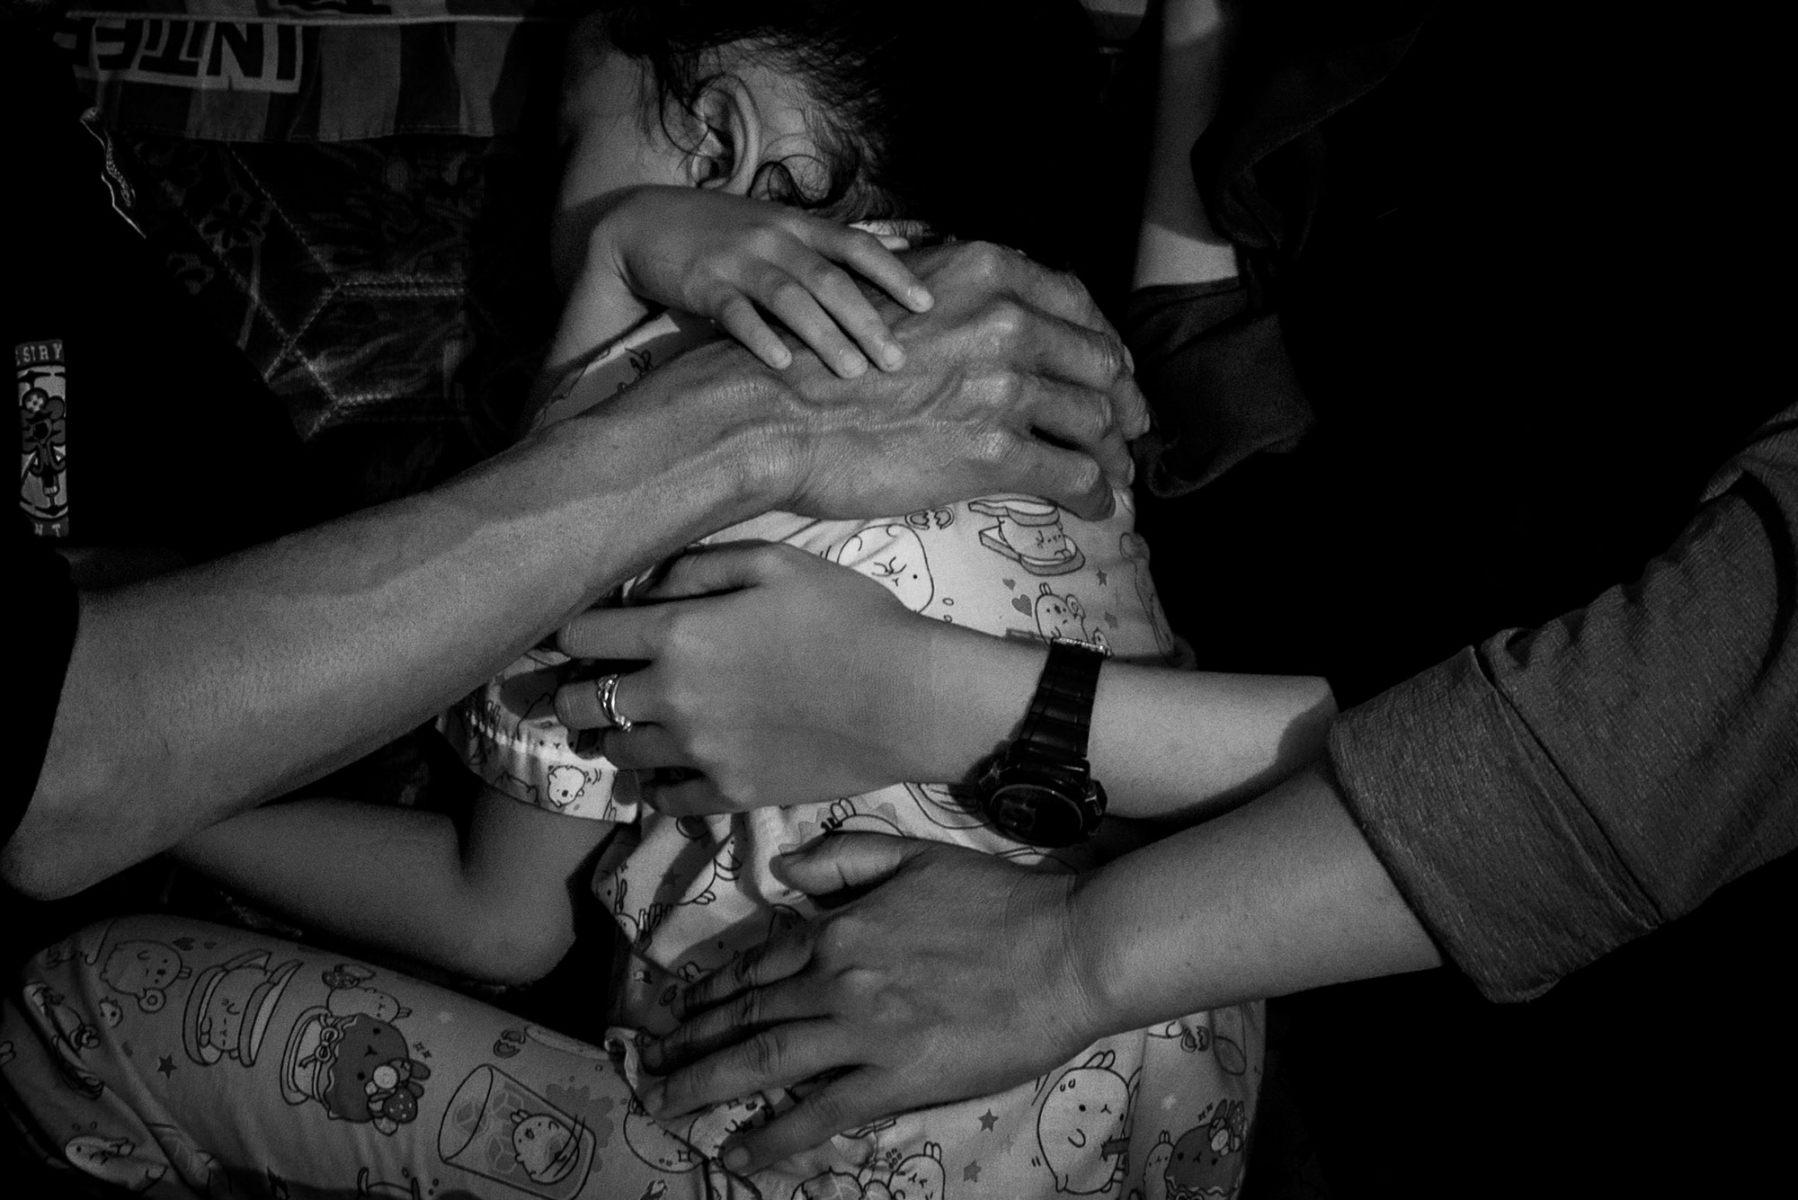 Tumpukan tangan keluarga Nadi Bin Eji alias Amang di rumahnya di kawasan Pondok Ranggon, Jakarta Timur.